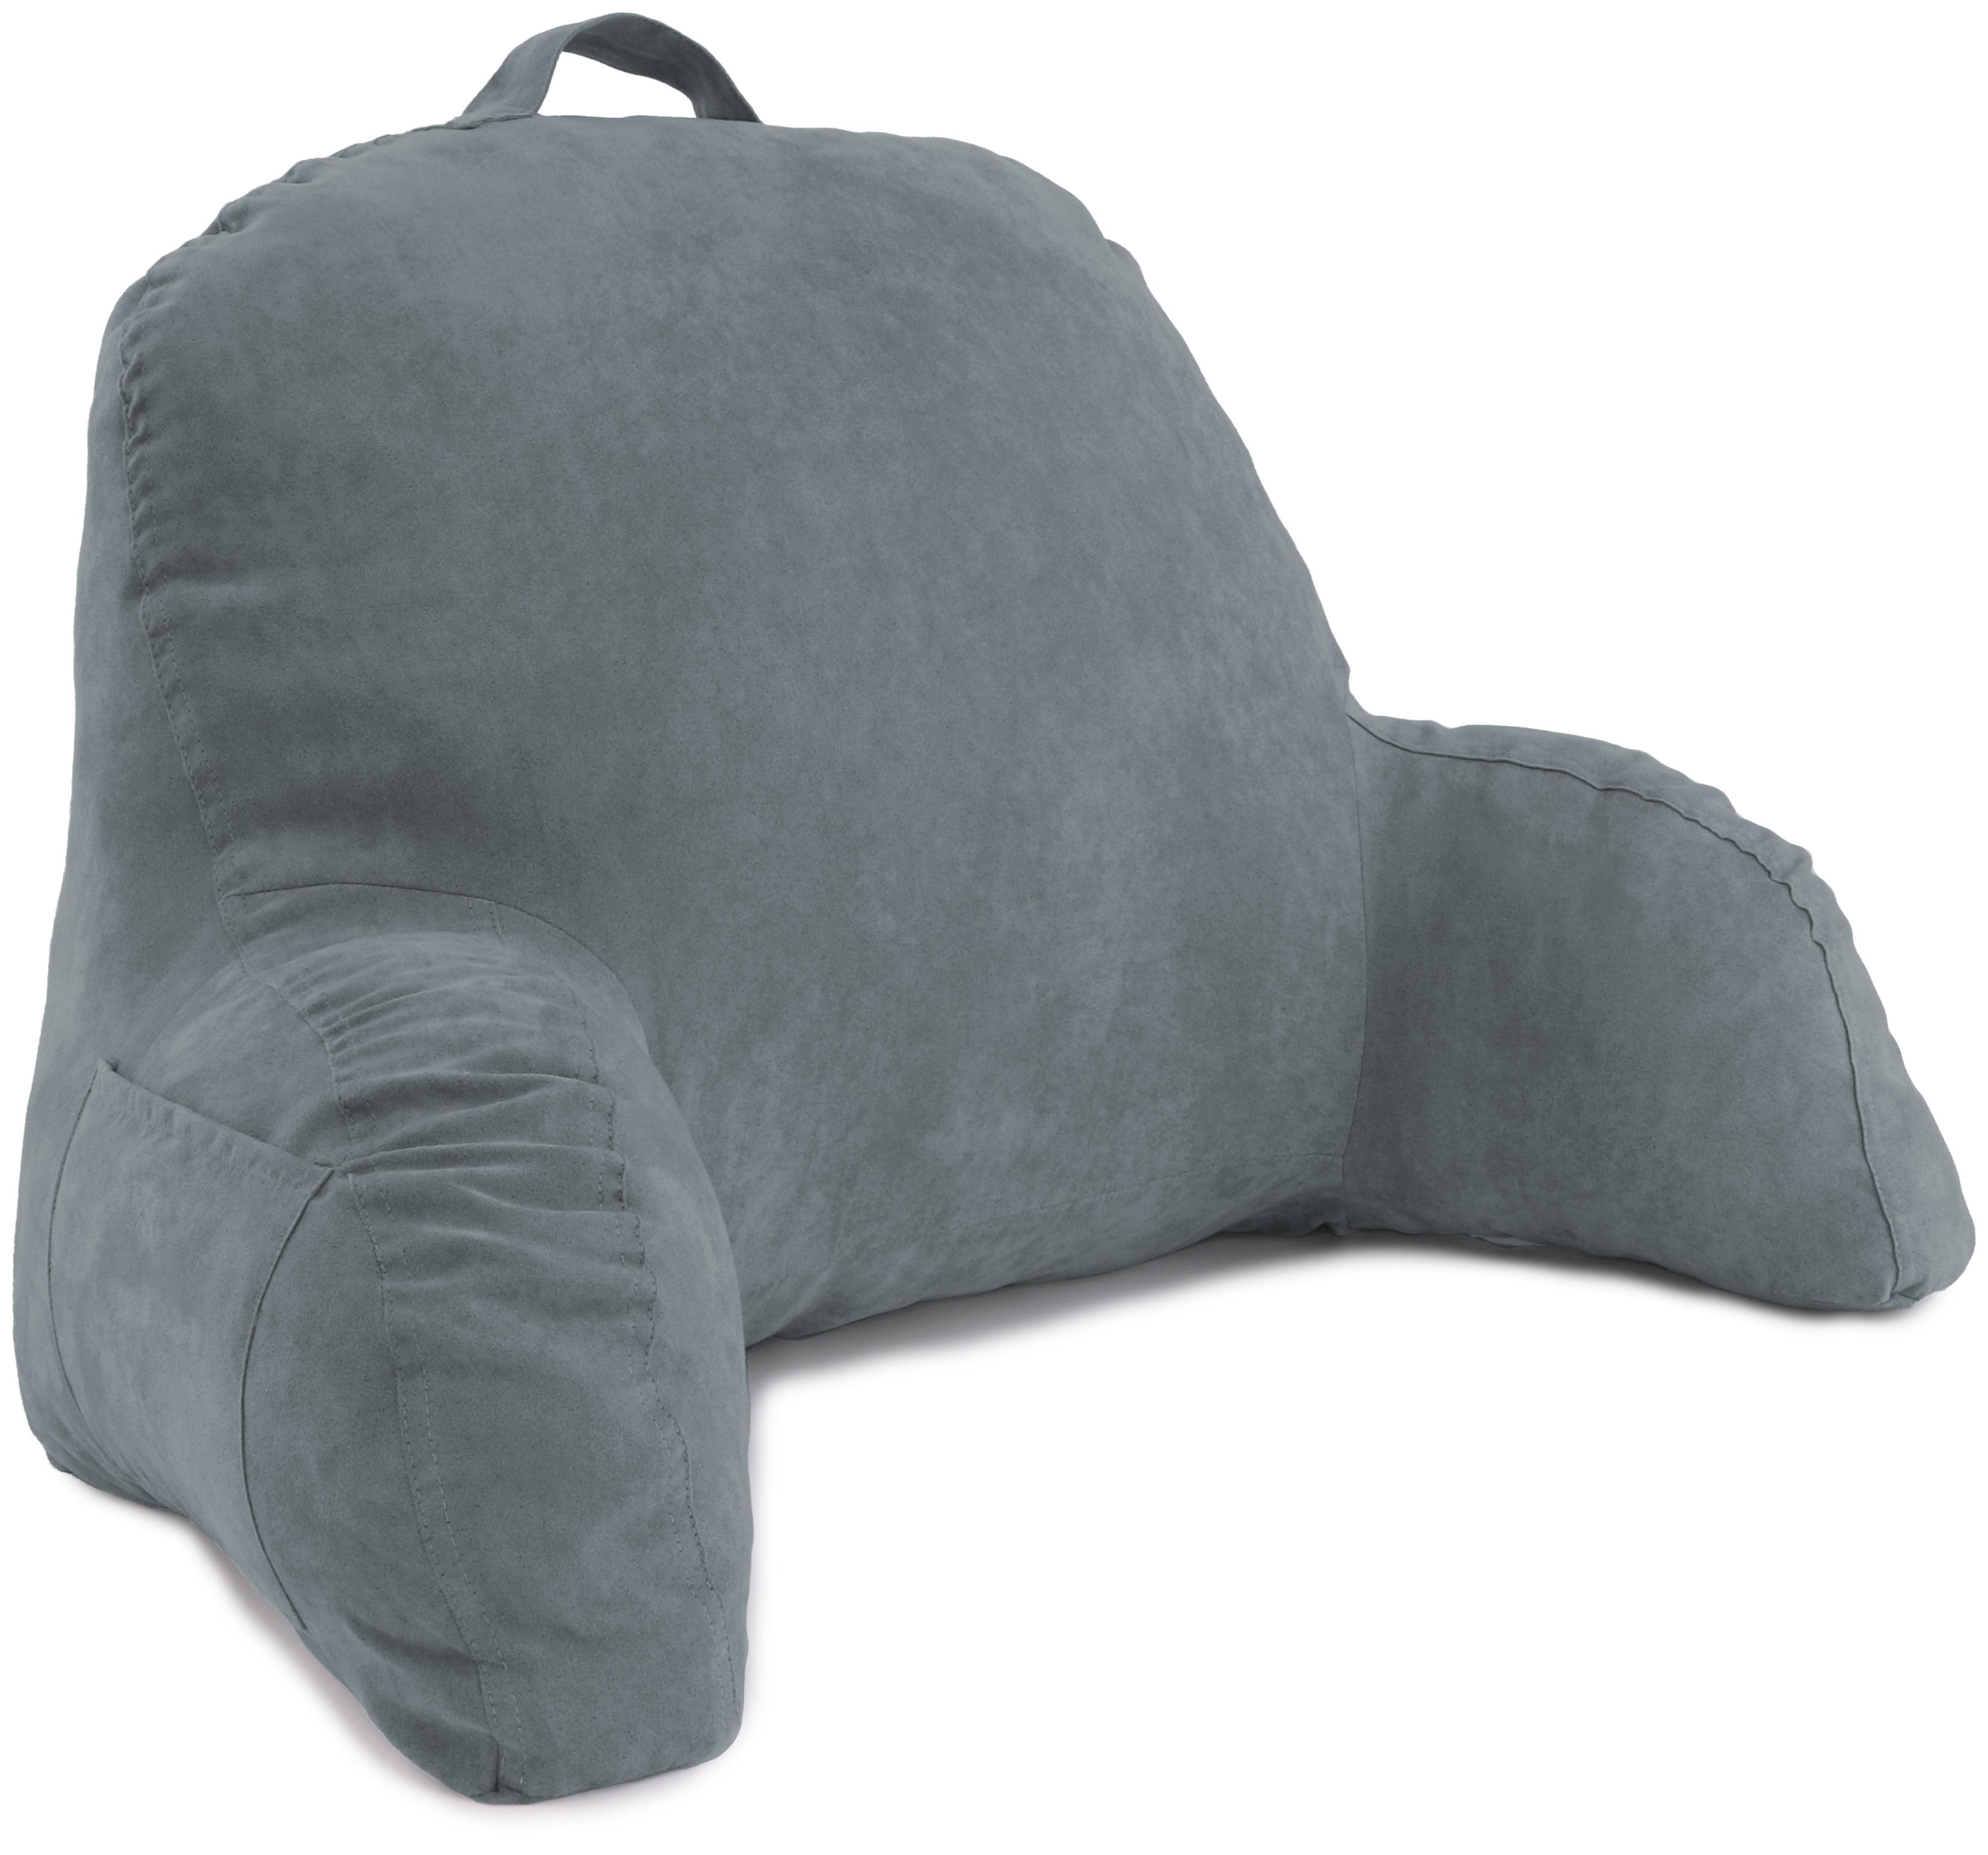 Deluxe Comfort Microsuede Bed Rest 226 Reading And Bedrest